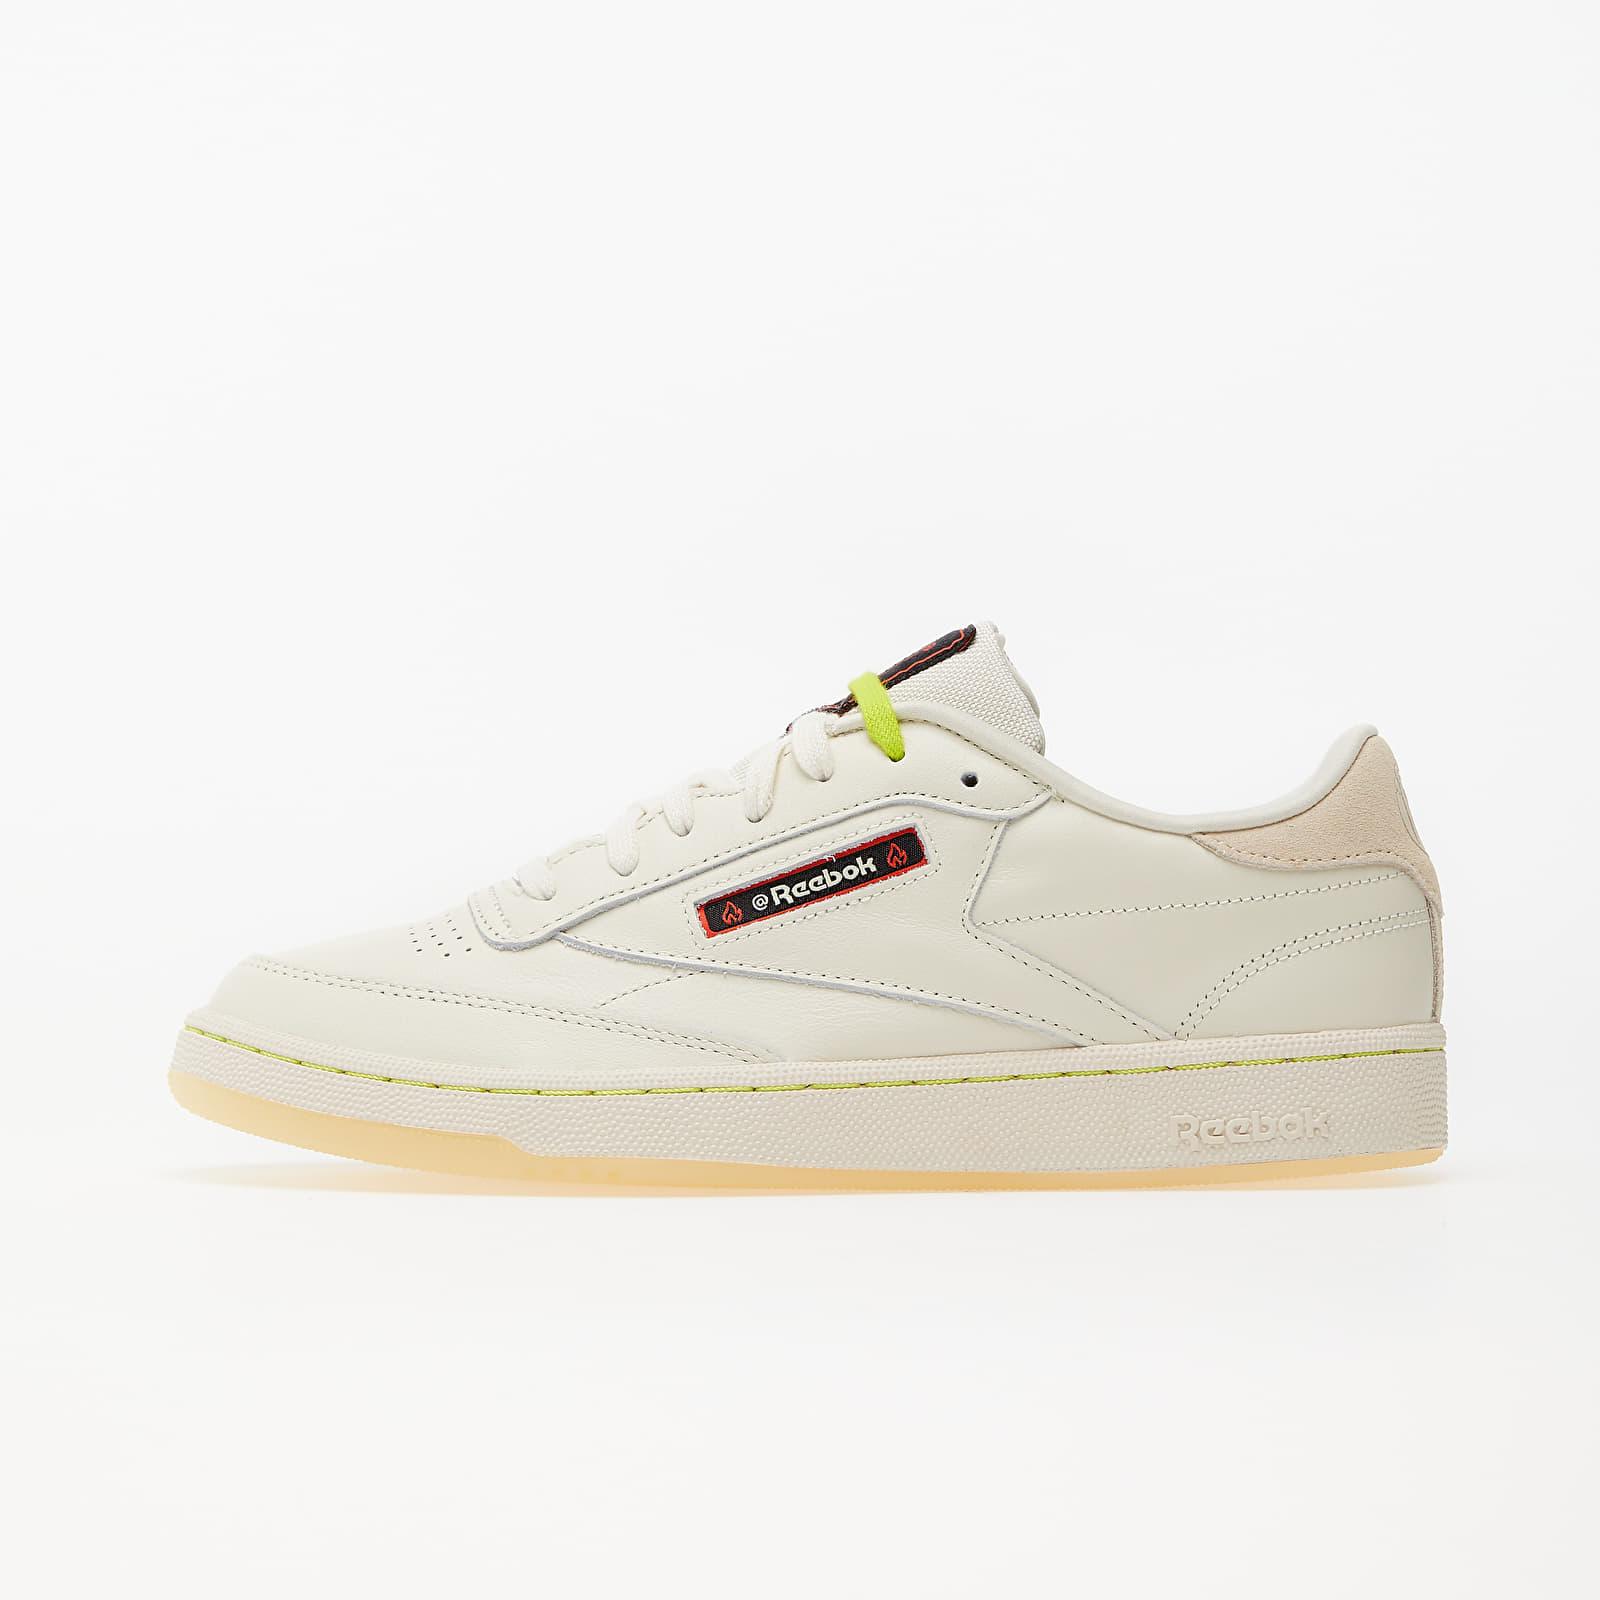 Pánske tenisky a topánky Reebok x Hot Ones Club C 85 Classic White/ Paperwhite/ Sandtrap